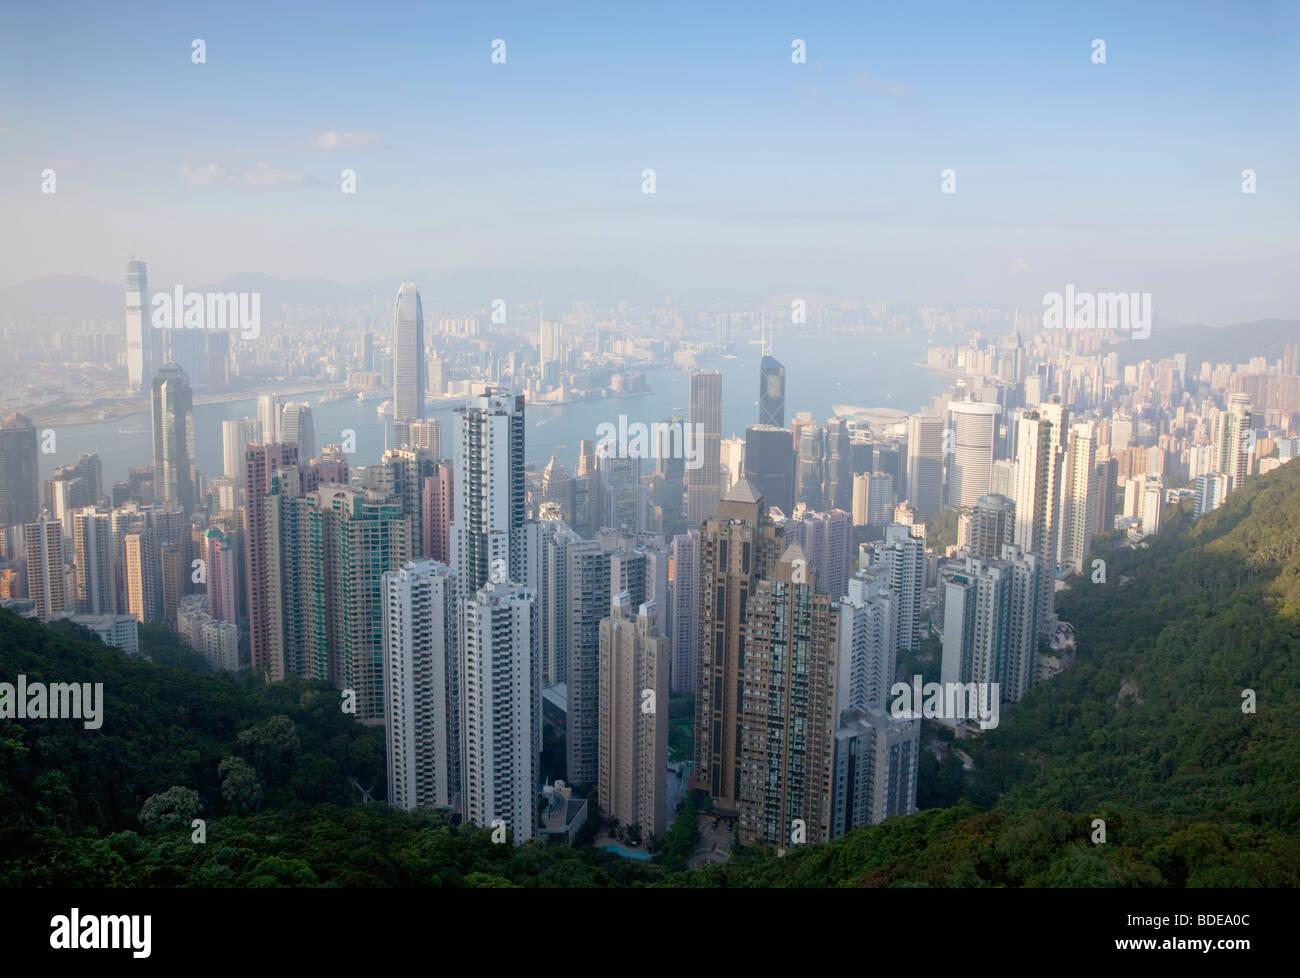 Blick vom Gipfel, Shan Teng, Hong Kong, China. Stockbild